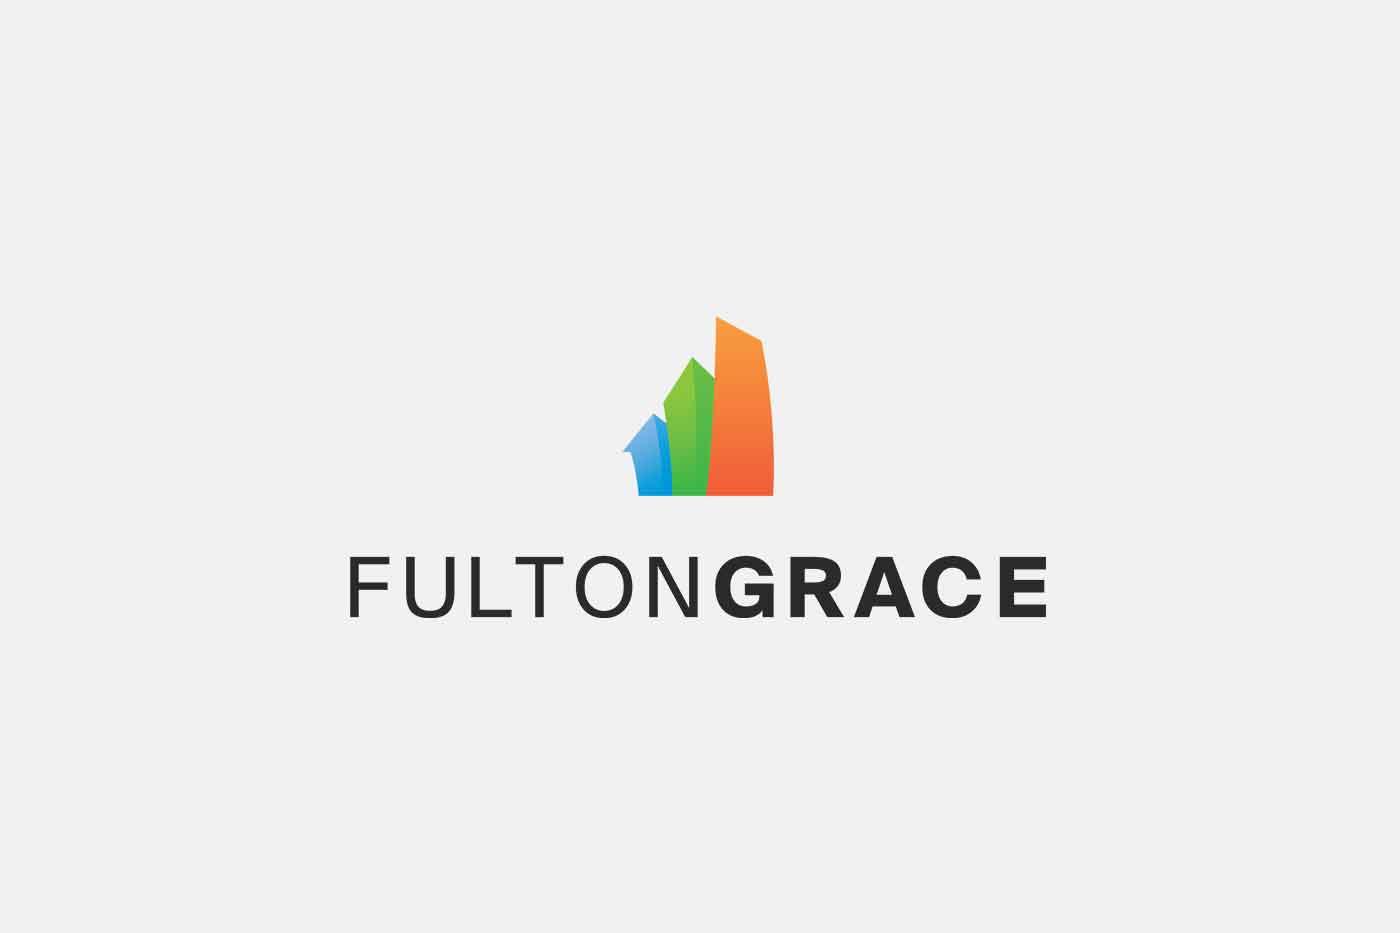 Fulton Grace